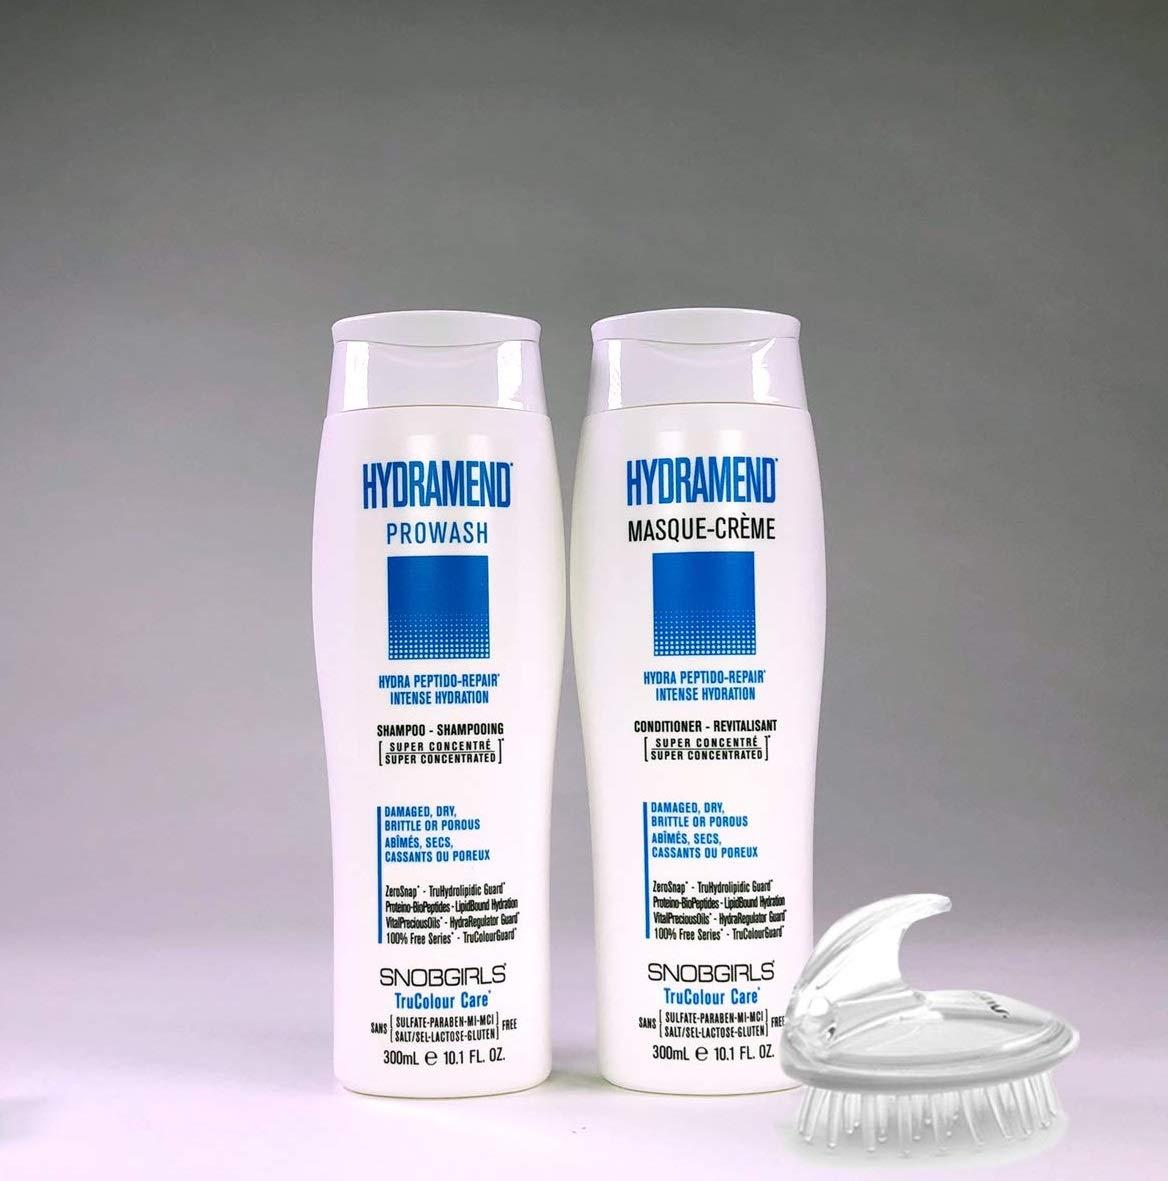 TRIO HYDRAMEND Bundle- 1 Shampoo 10oz. bundle with1 Conditioner 10oz & 1 Shampoo Brush (3 items) Lactose & Gluten Free For Damaged, Dry, Brittle or Porous Hair